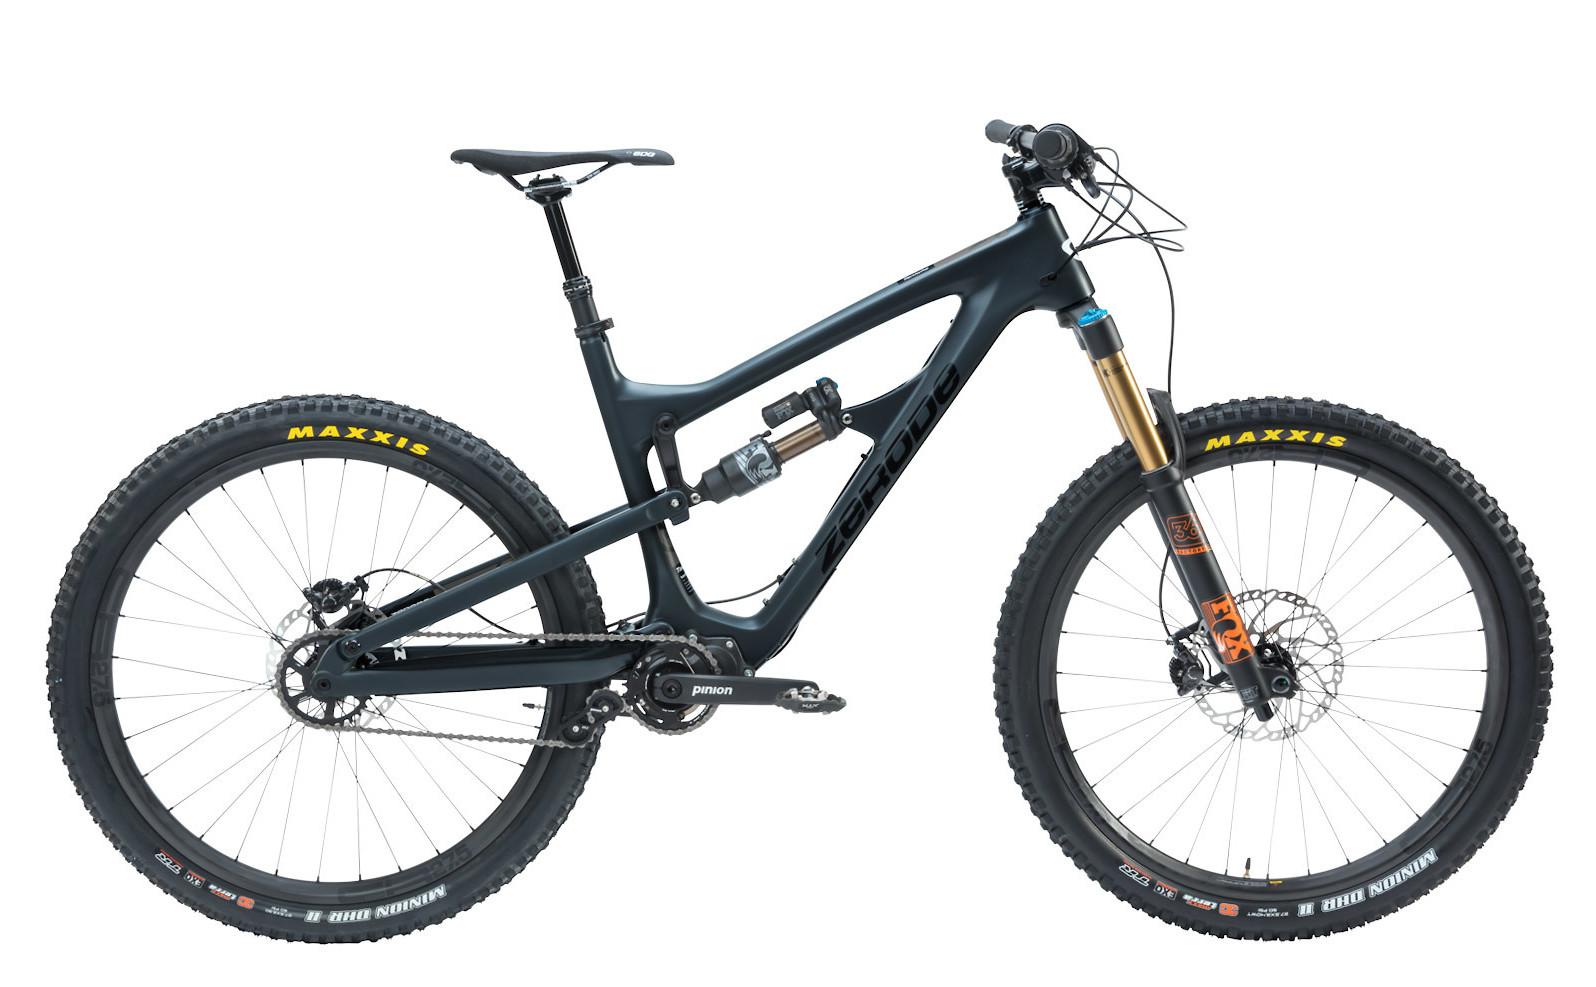 2019 Zerode Taniwha Trail Bike (Signature build shown in photos)